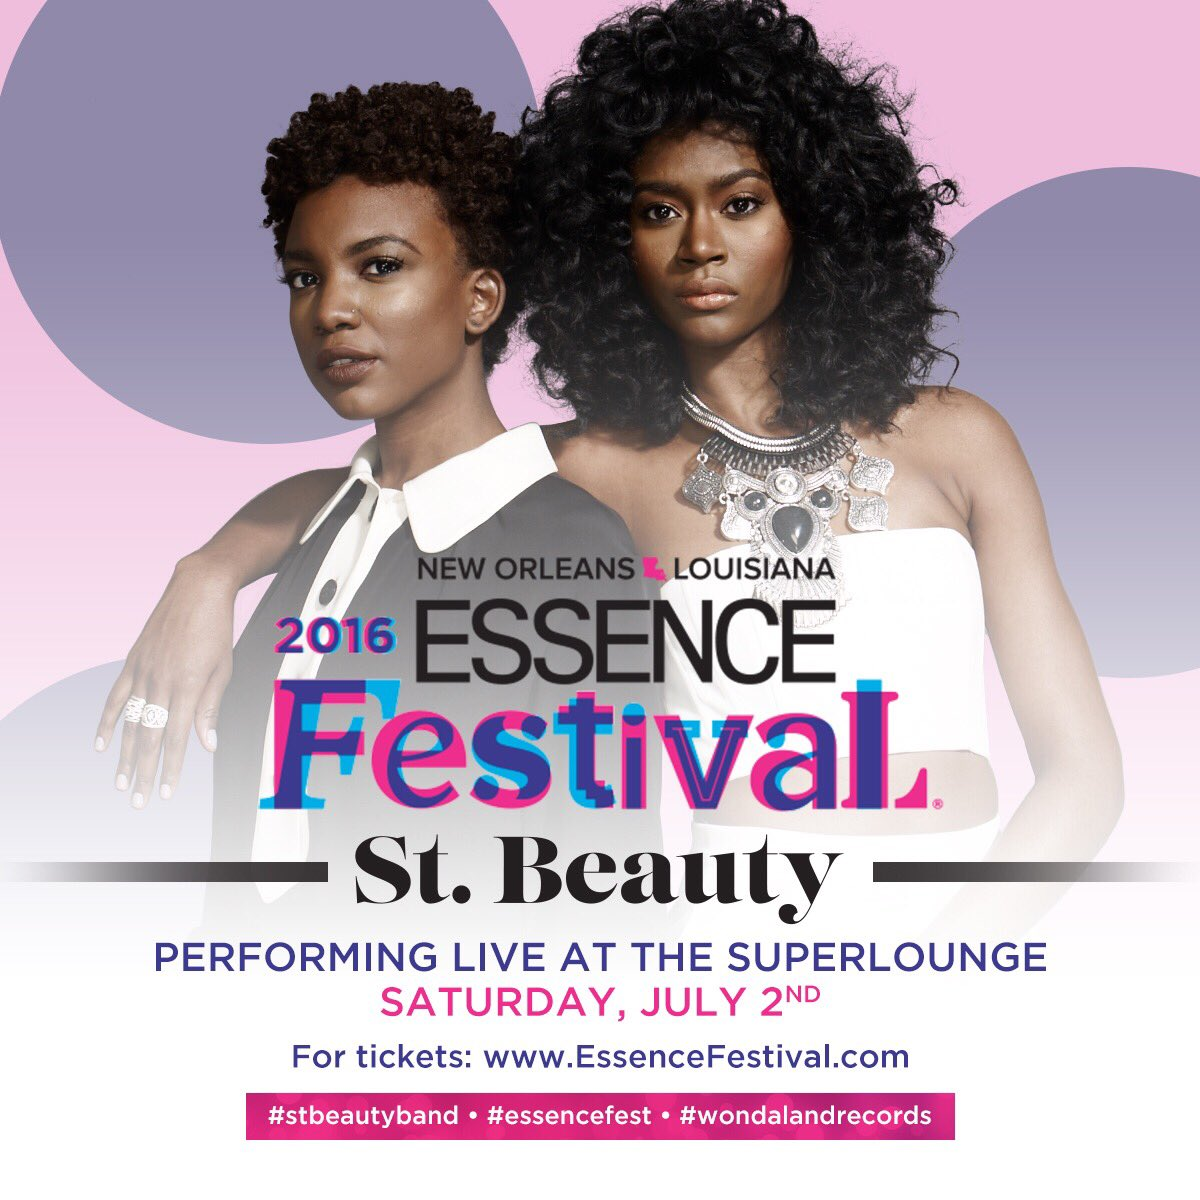 #BlackGirlMagic is coming to the 2016 @EssenceFest ! #StBeautyBand #EssenceFest #WondalandRecords https://t.co/TWMbVAUX8N